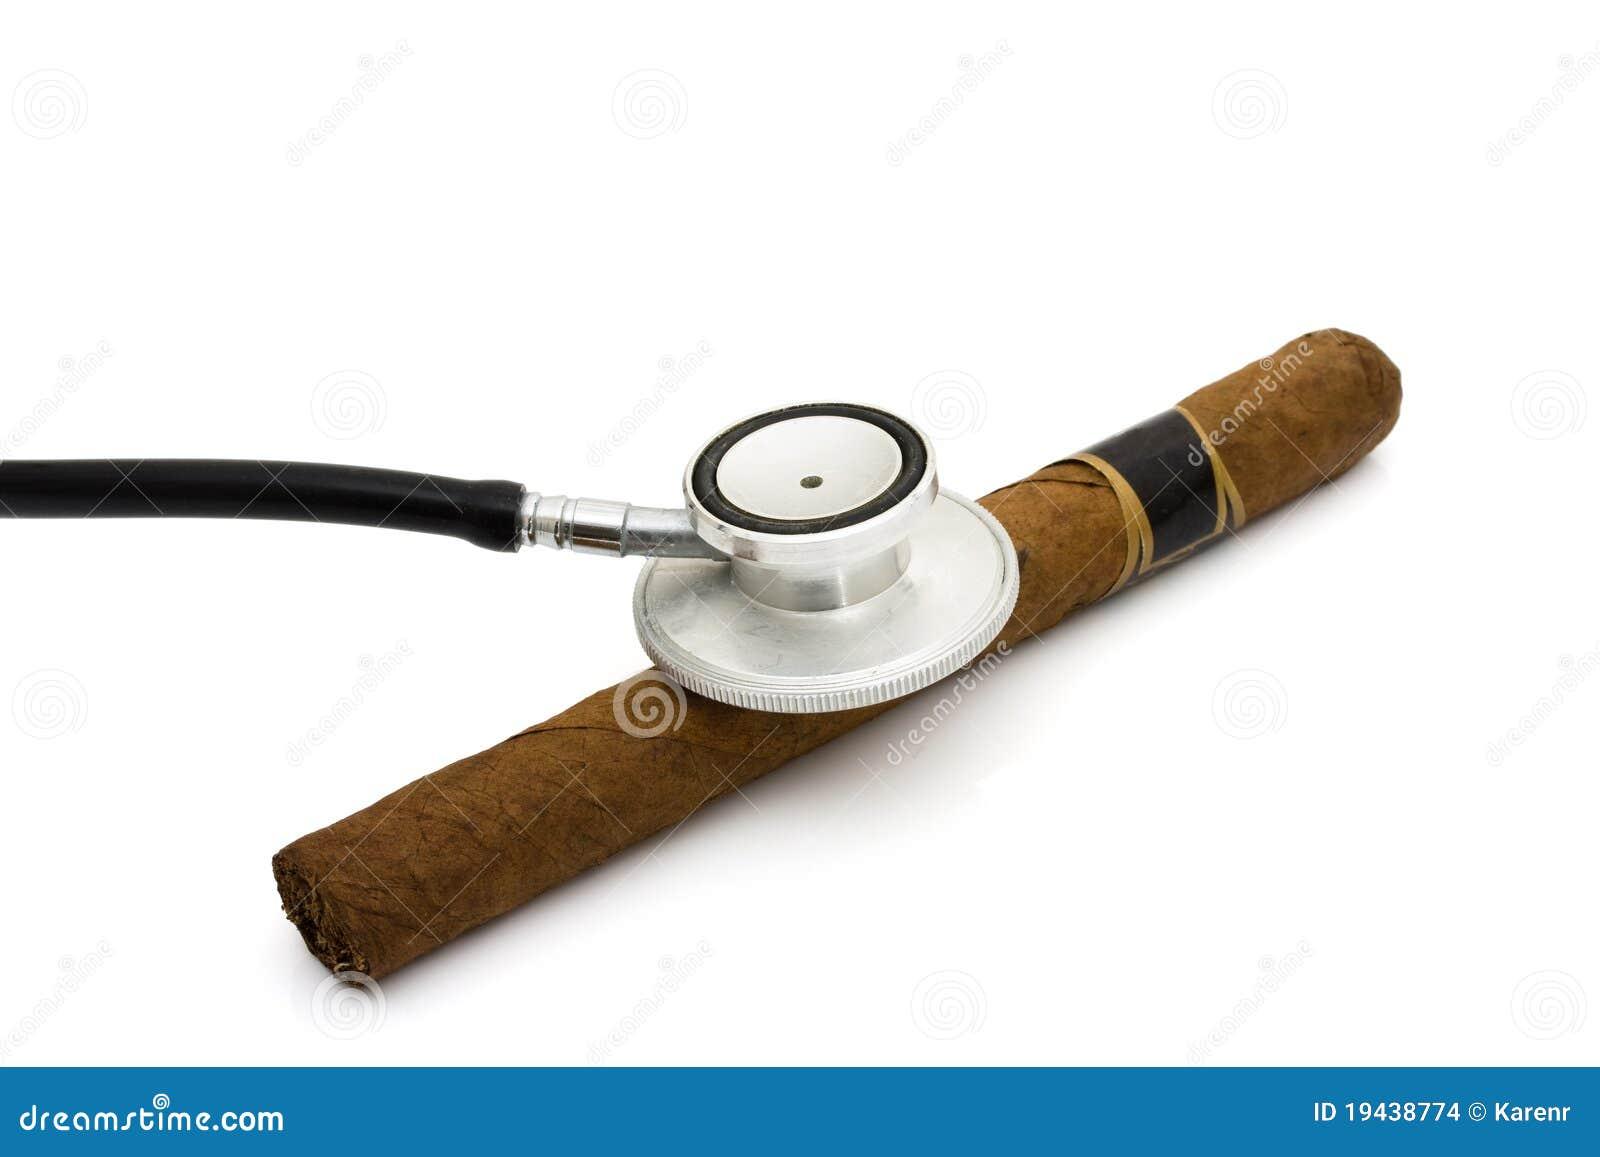 essay on health risks of smoking